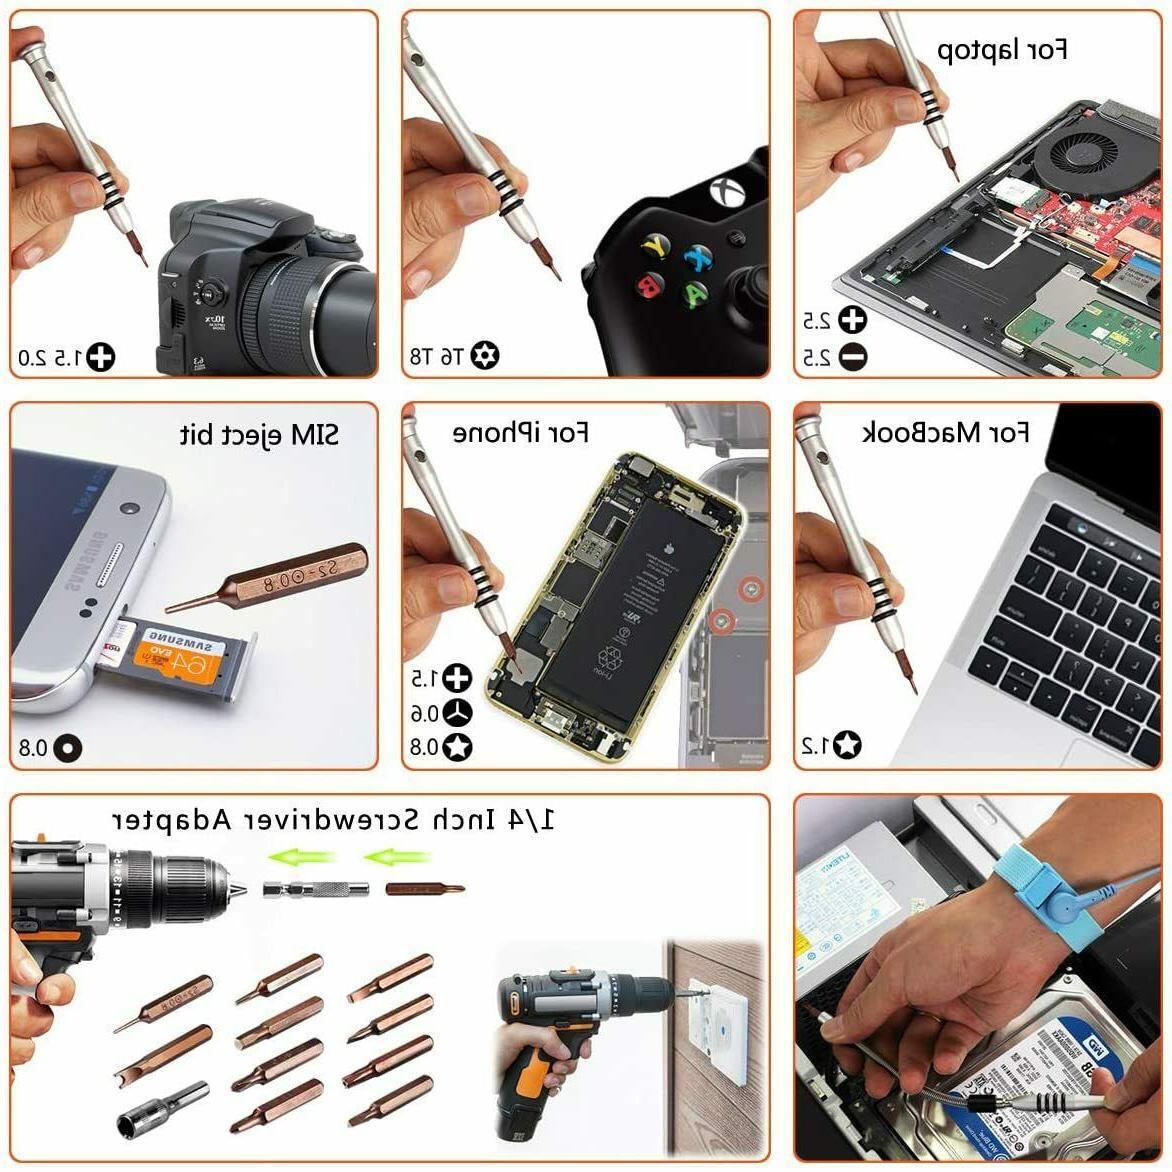 90pcs Tool Kit Screwdriver PC iPhone Table Phone